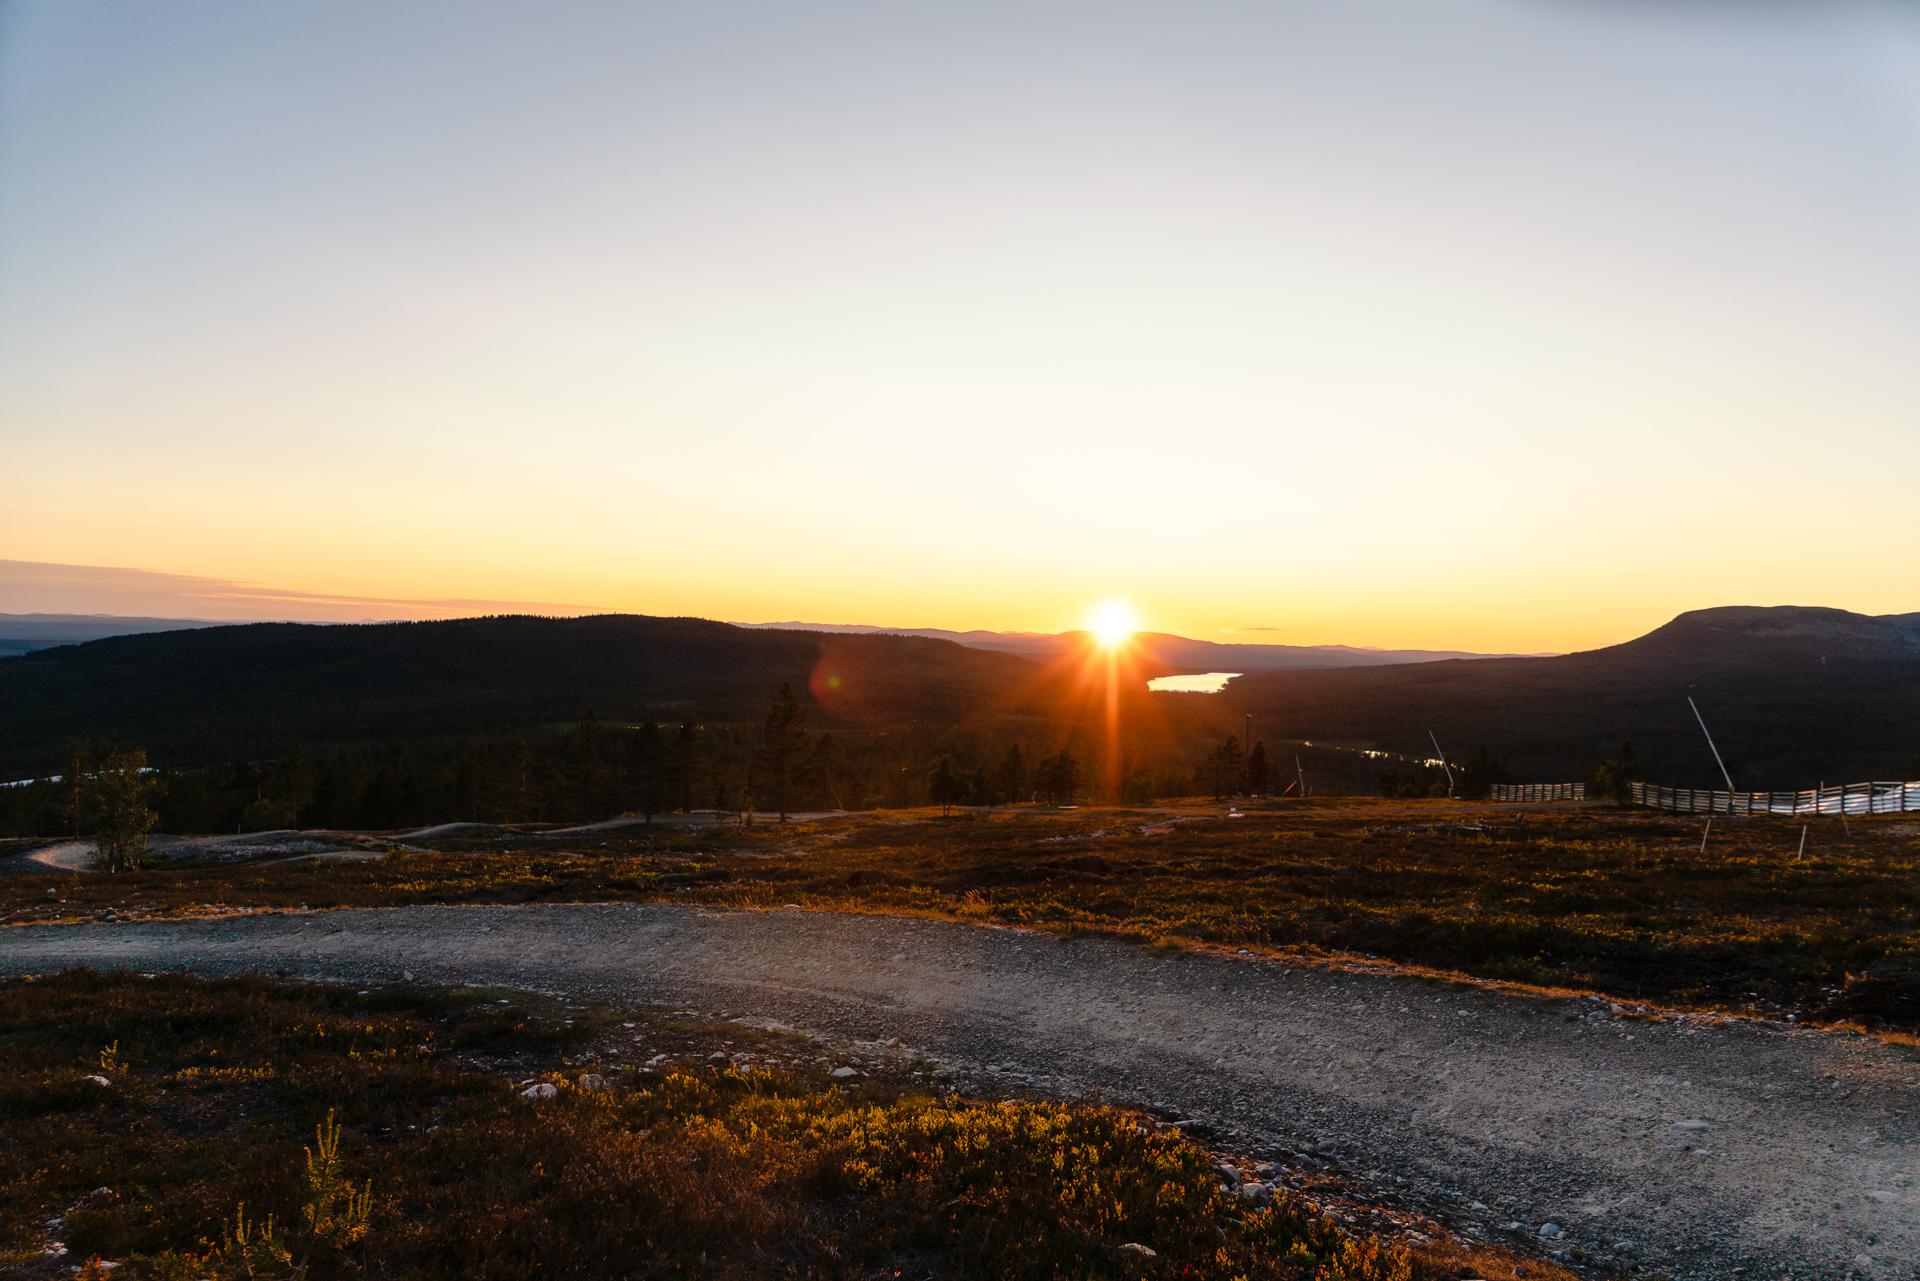 Mountainbike-cykling på Idre Fjäll